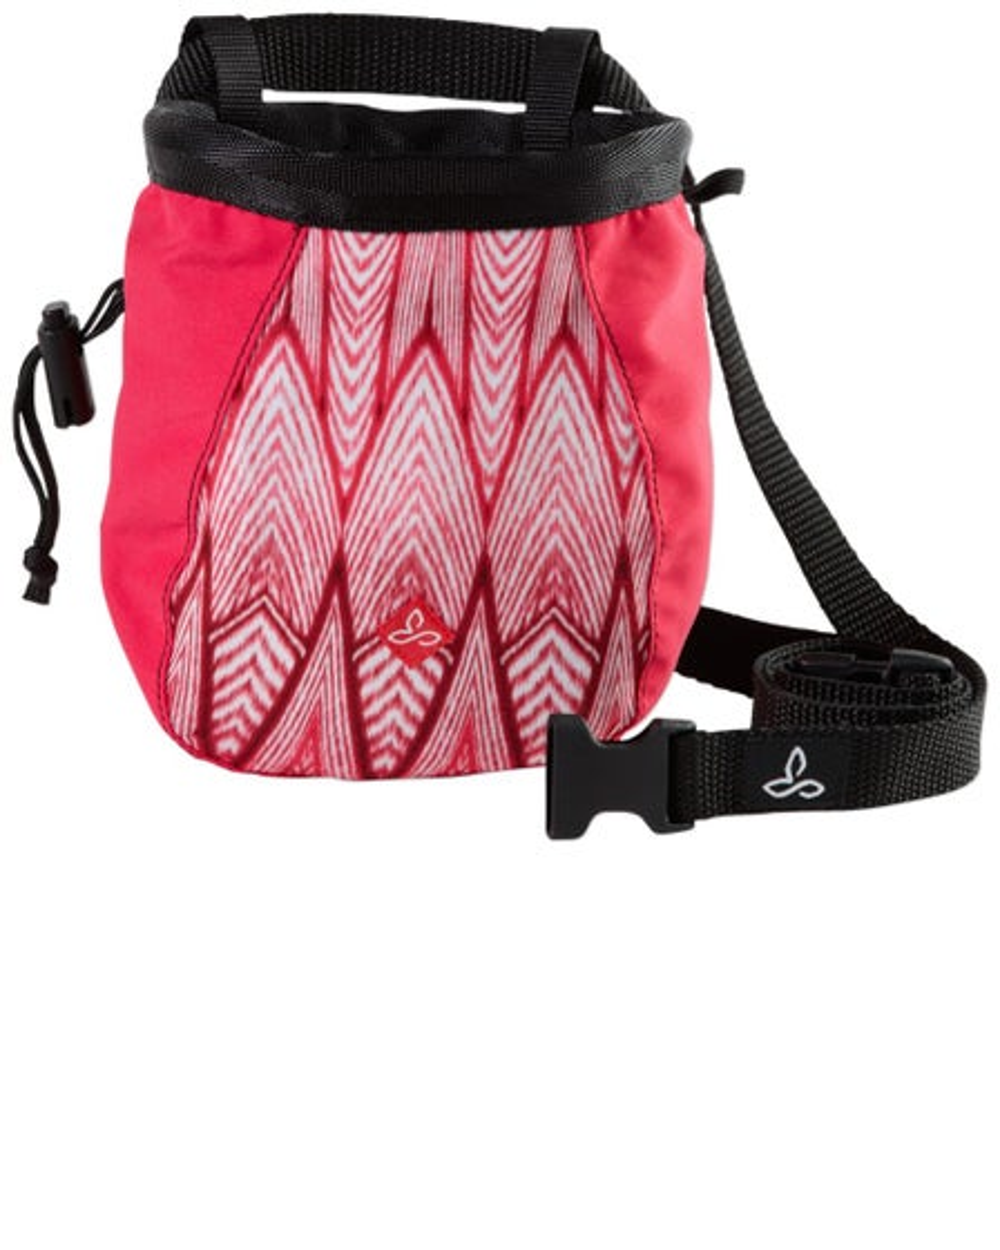 2016 Prana Chalk Bag in Azalea Feather